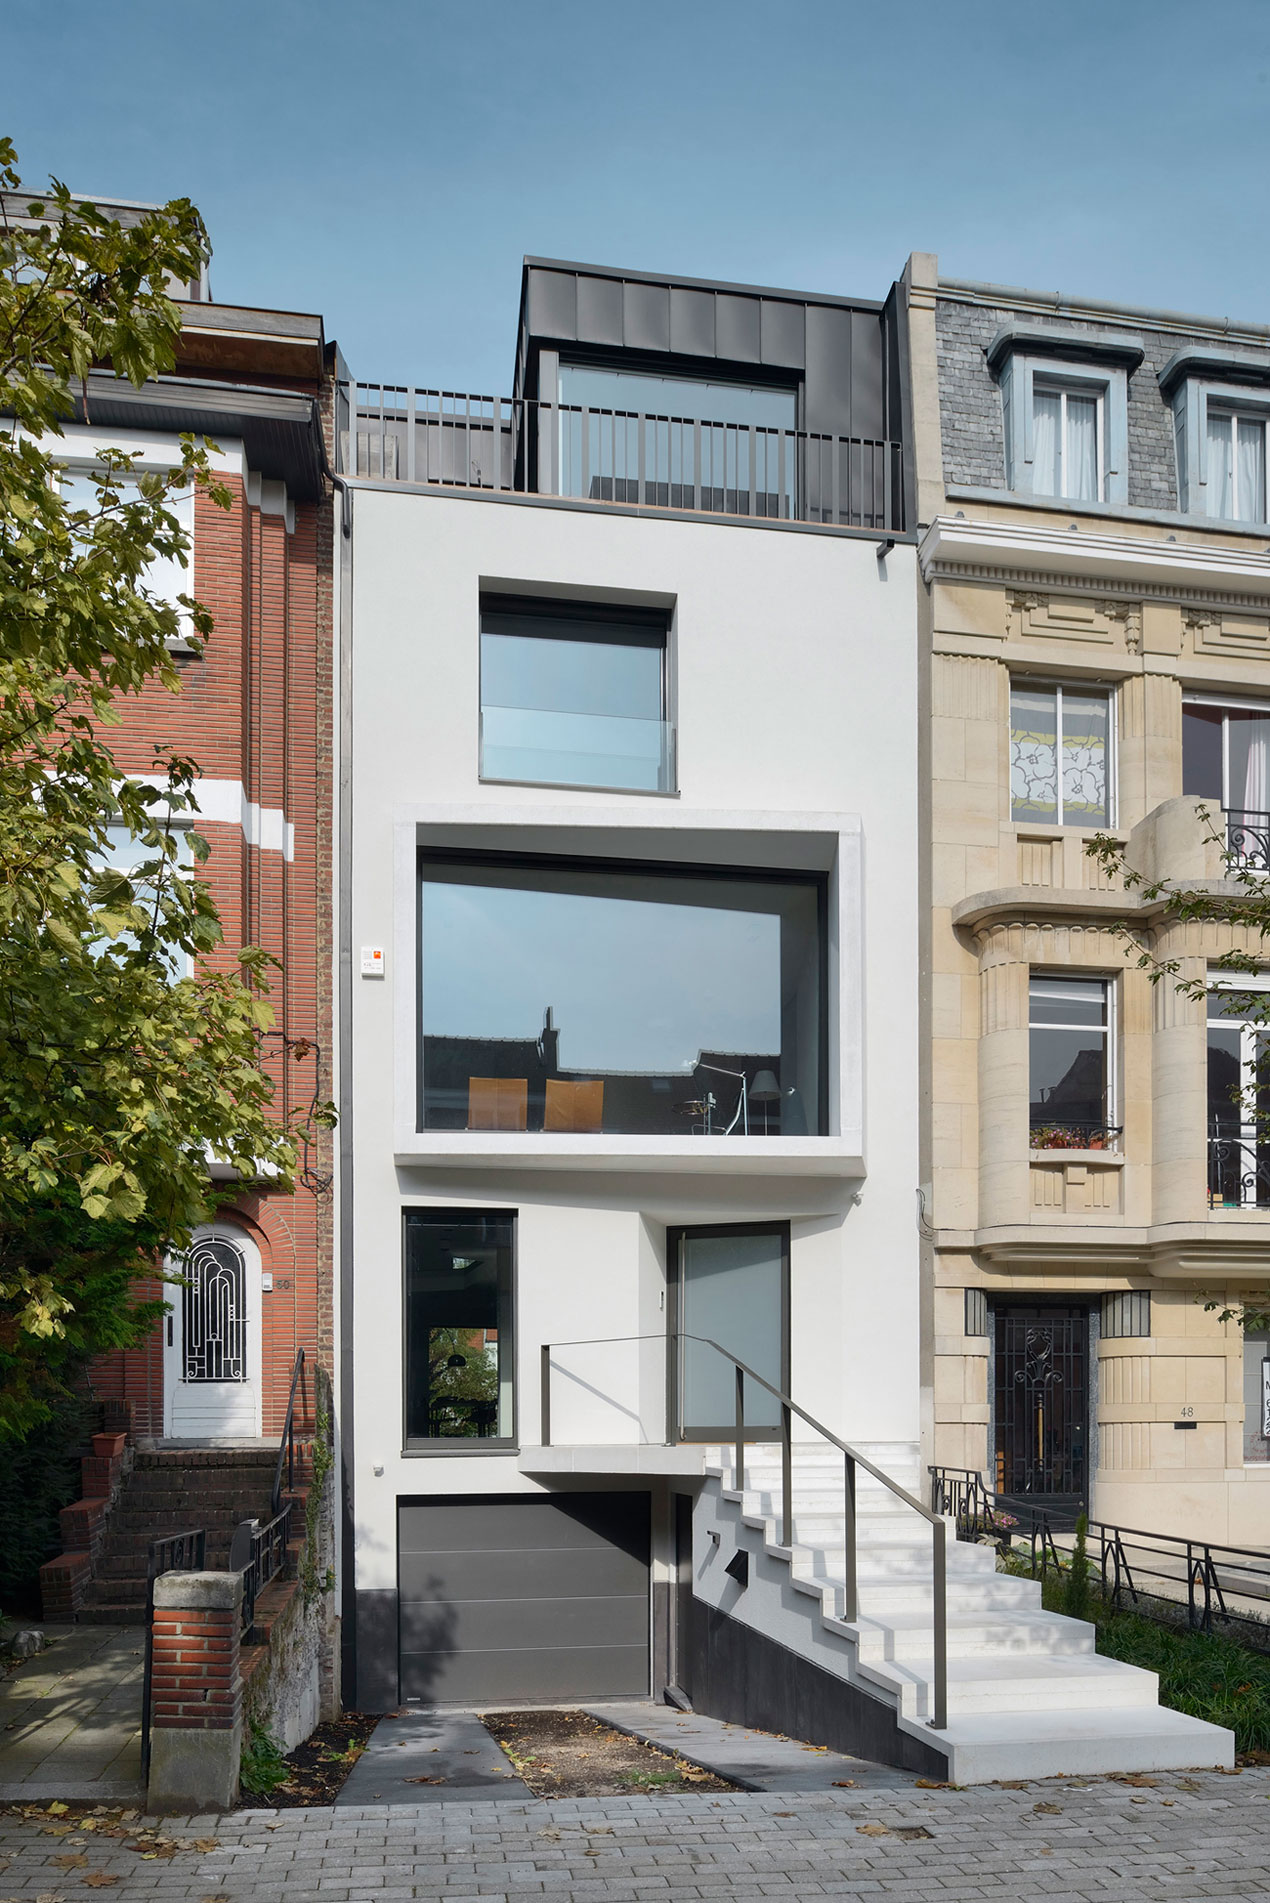 Urban Platform Designs a Vertical Home in Brussels, Belgium